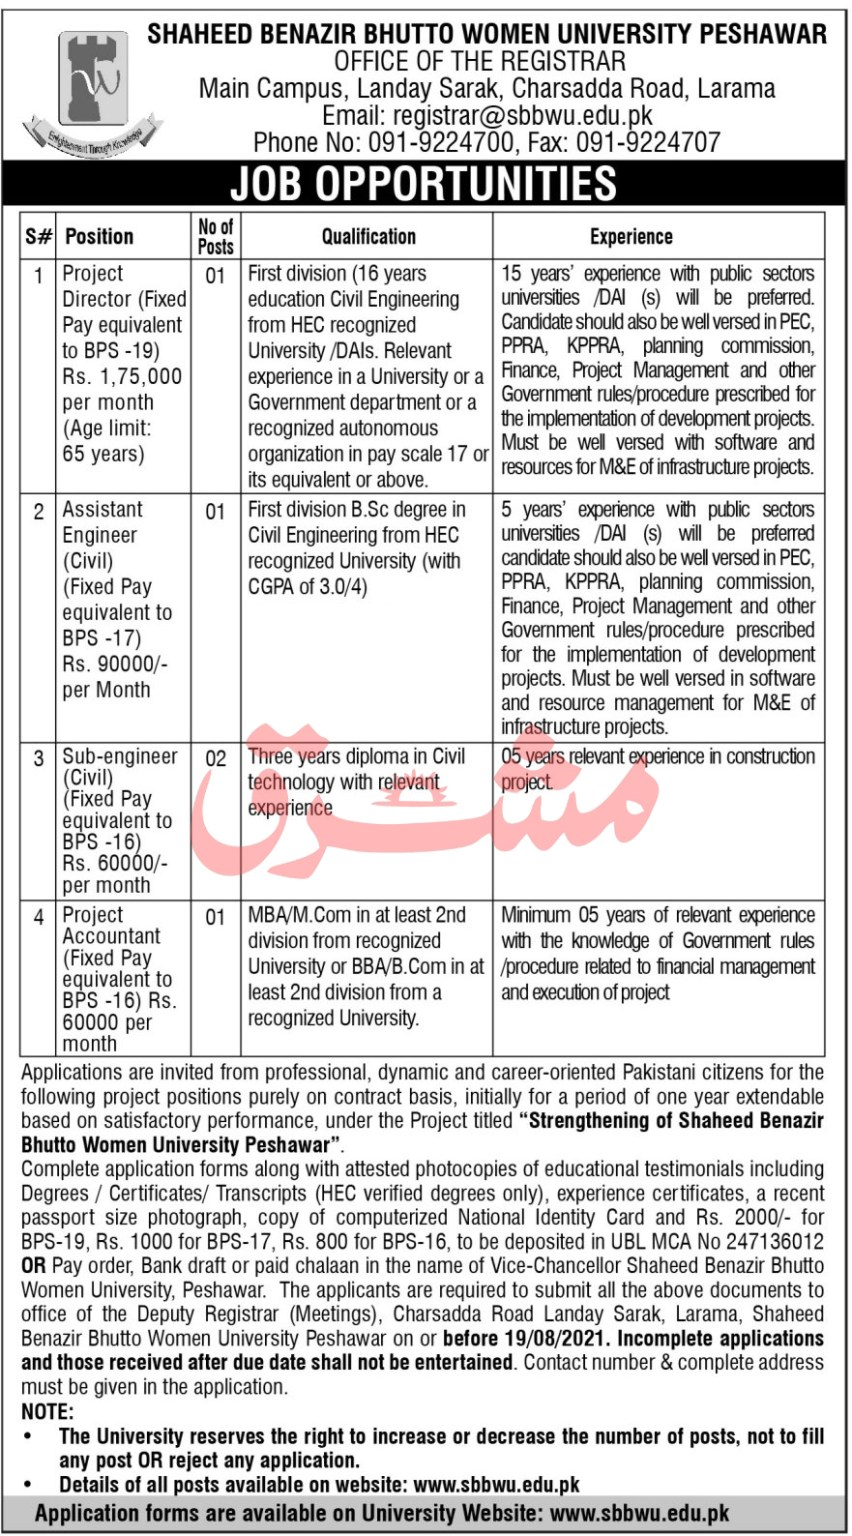 www.sbbwu.edu.pk Jobs 2021 - Shaheed Benazir Bhutto Women University Peshawar Jobs 2021 in Pakistan